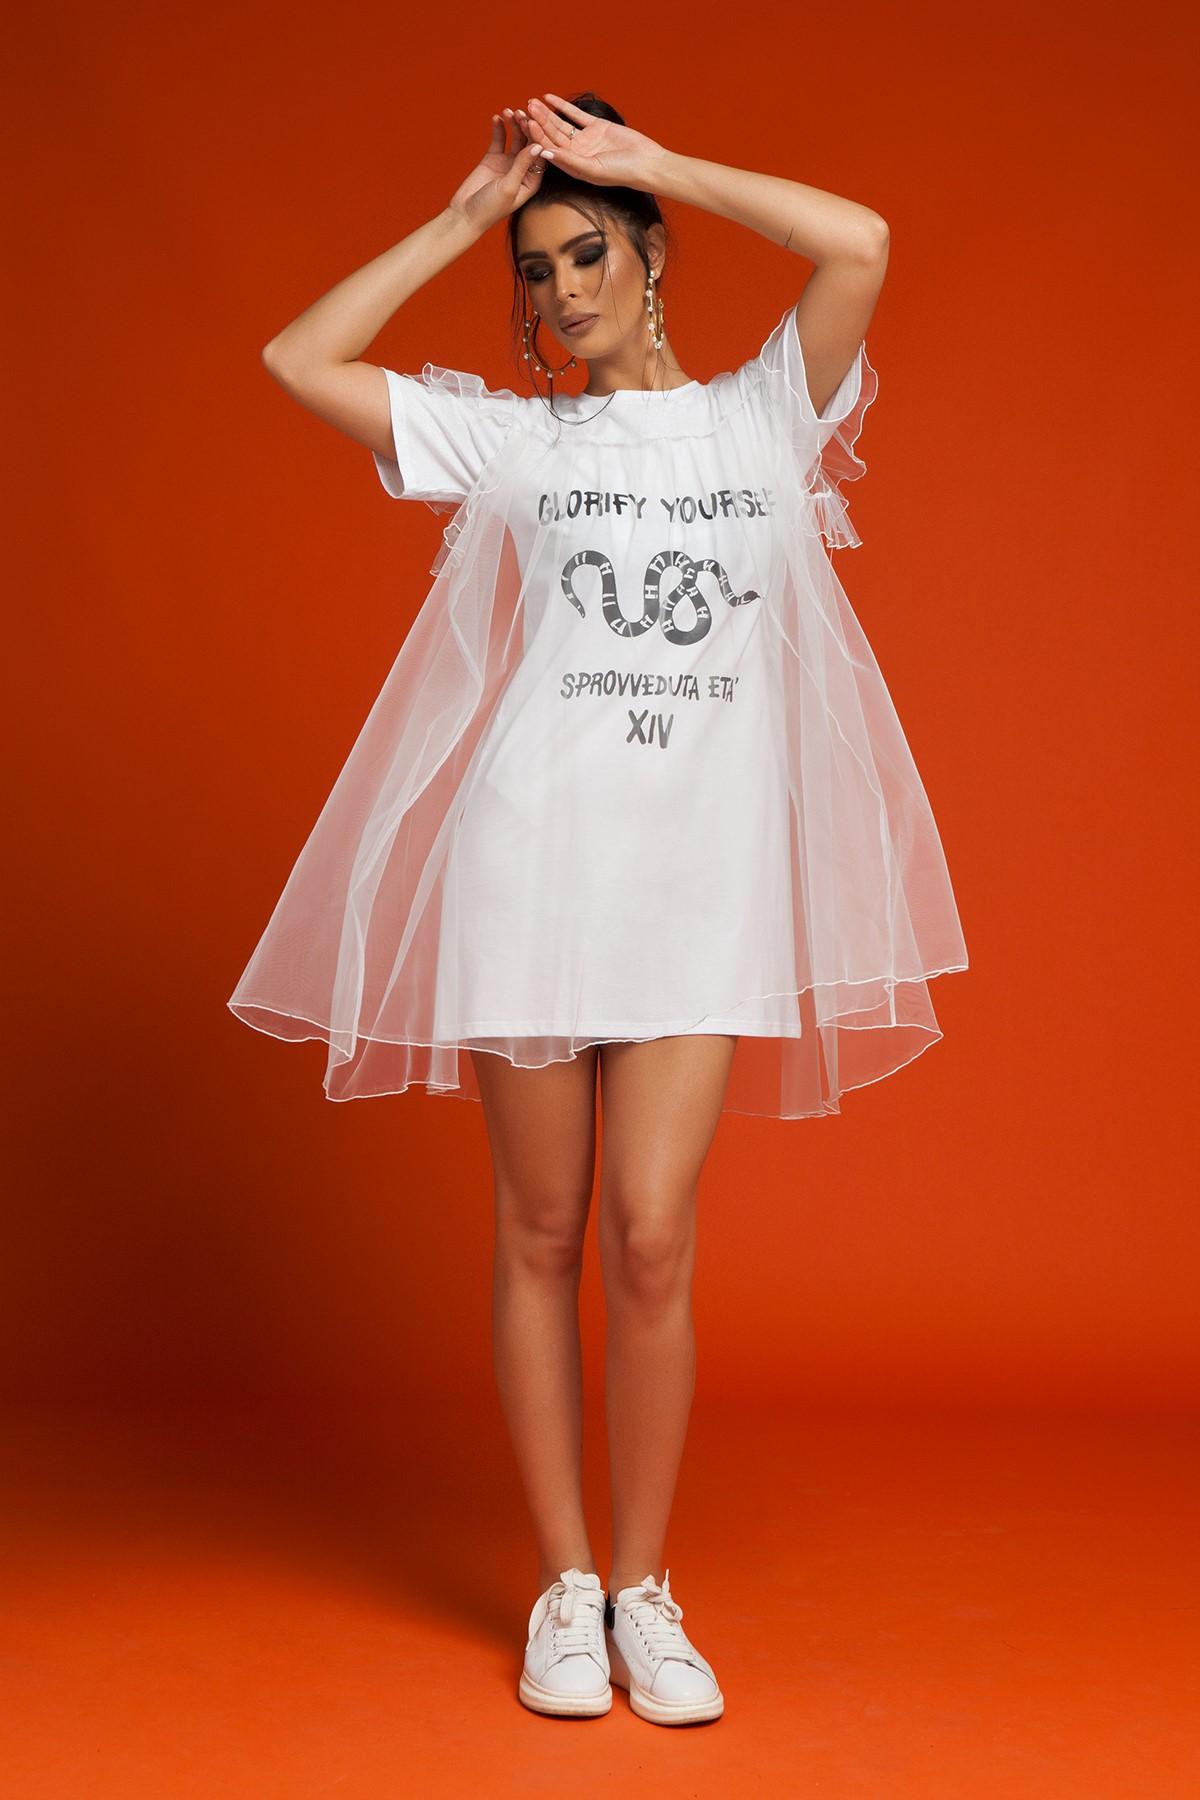 ba00567586f Nikole Collection - Дамска мода, Рокли, Комплекти, Поли, Якета, Ризи ...